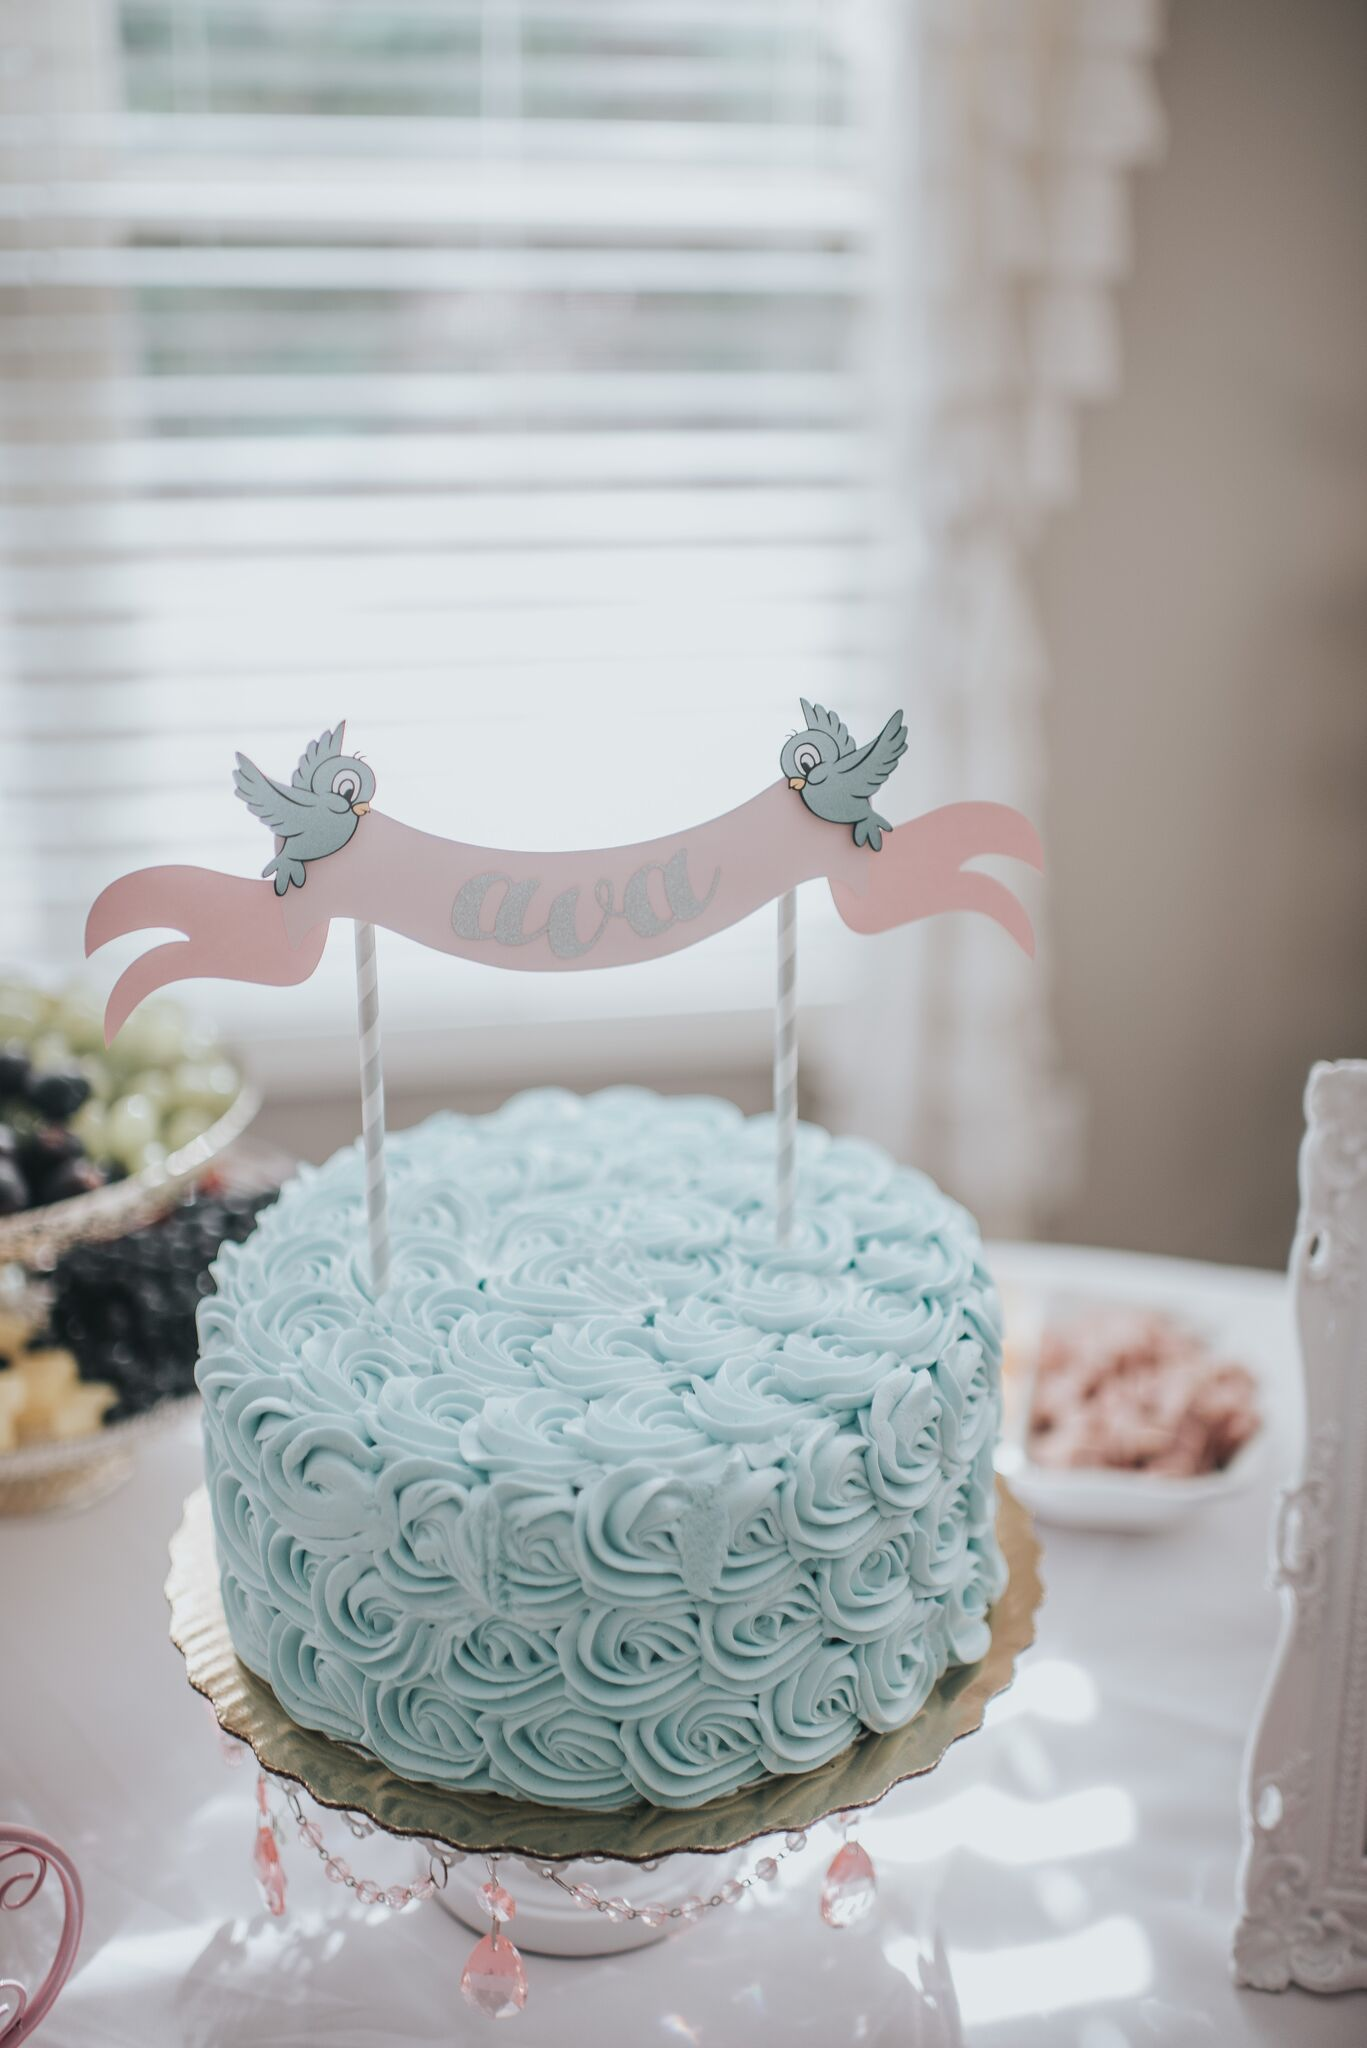 Avas Cinderella 3rd Birthday Birthday cakes Classy and Alternative